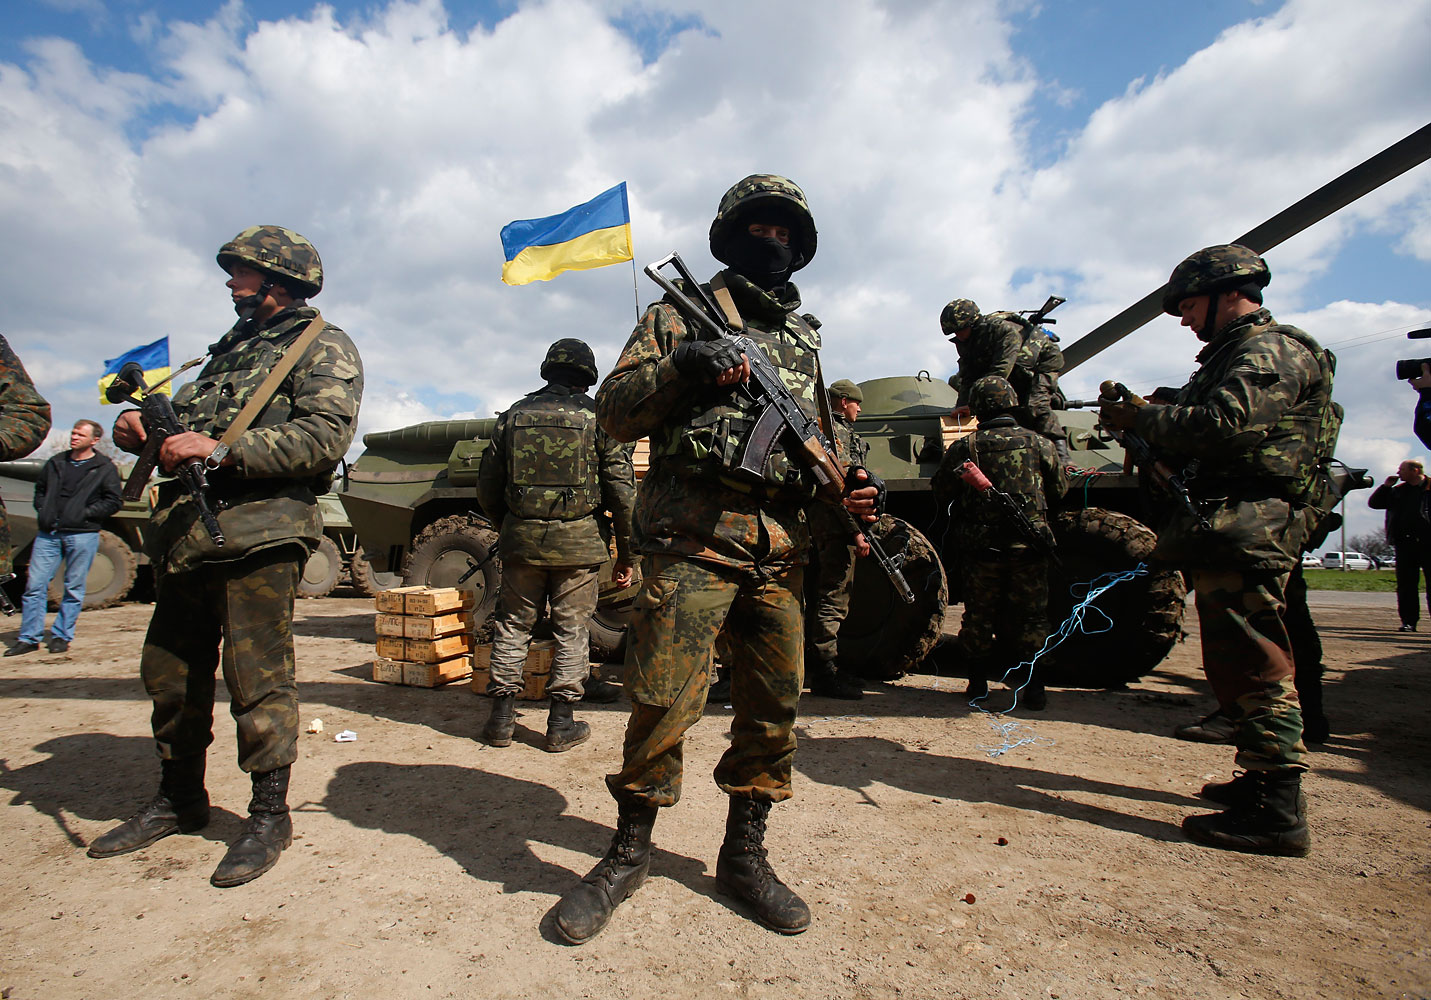 Ukrainian troops on the outskirts of Izyum, in eastern Ukraine, on April 15, 2014